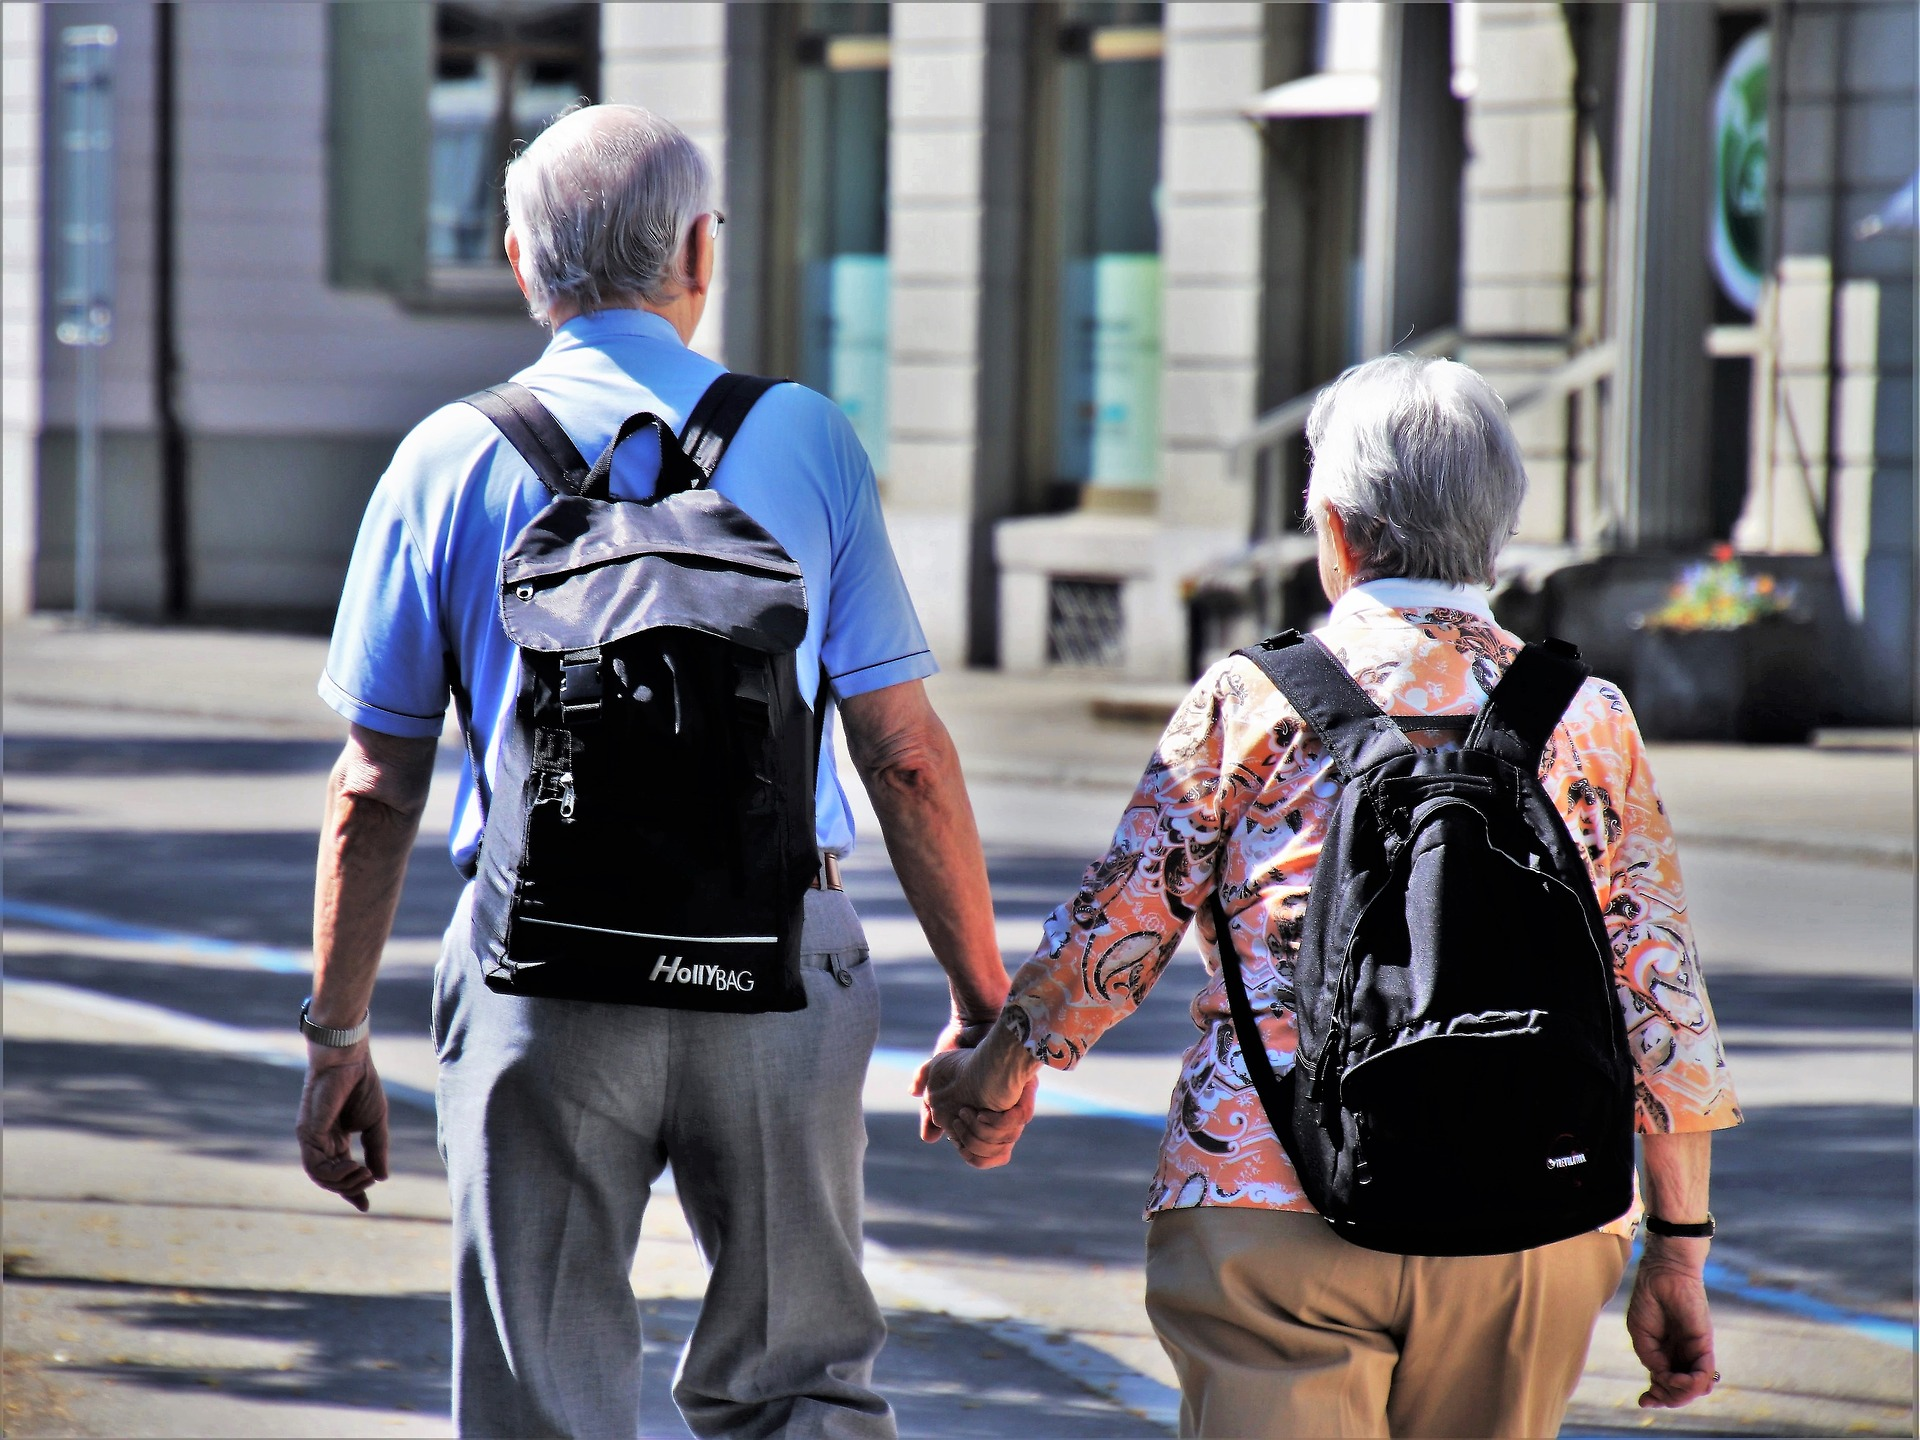 Intercâmbio 50+ : aumento na longevidade cria novos mercados por Daniel Amgarten